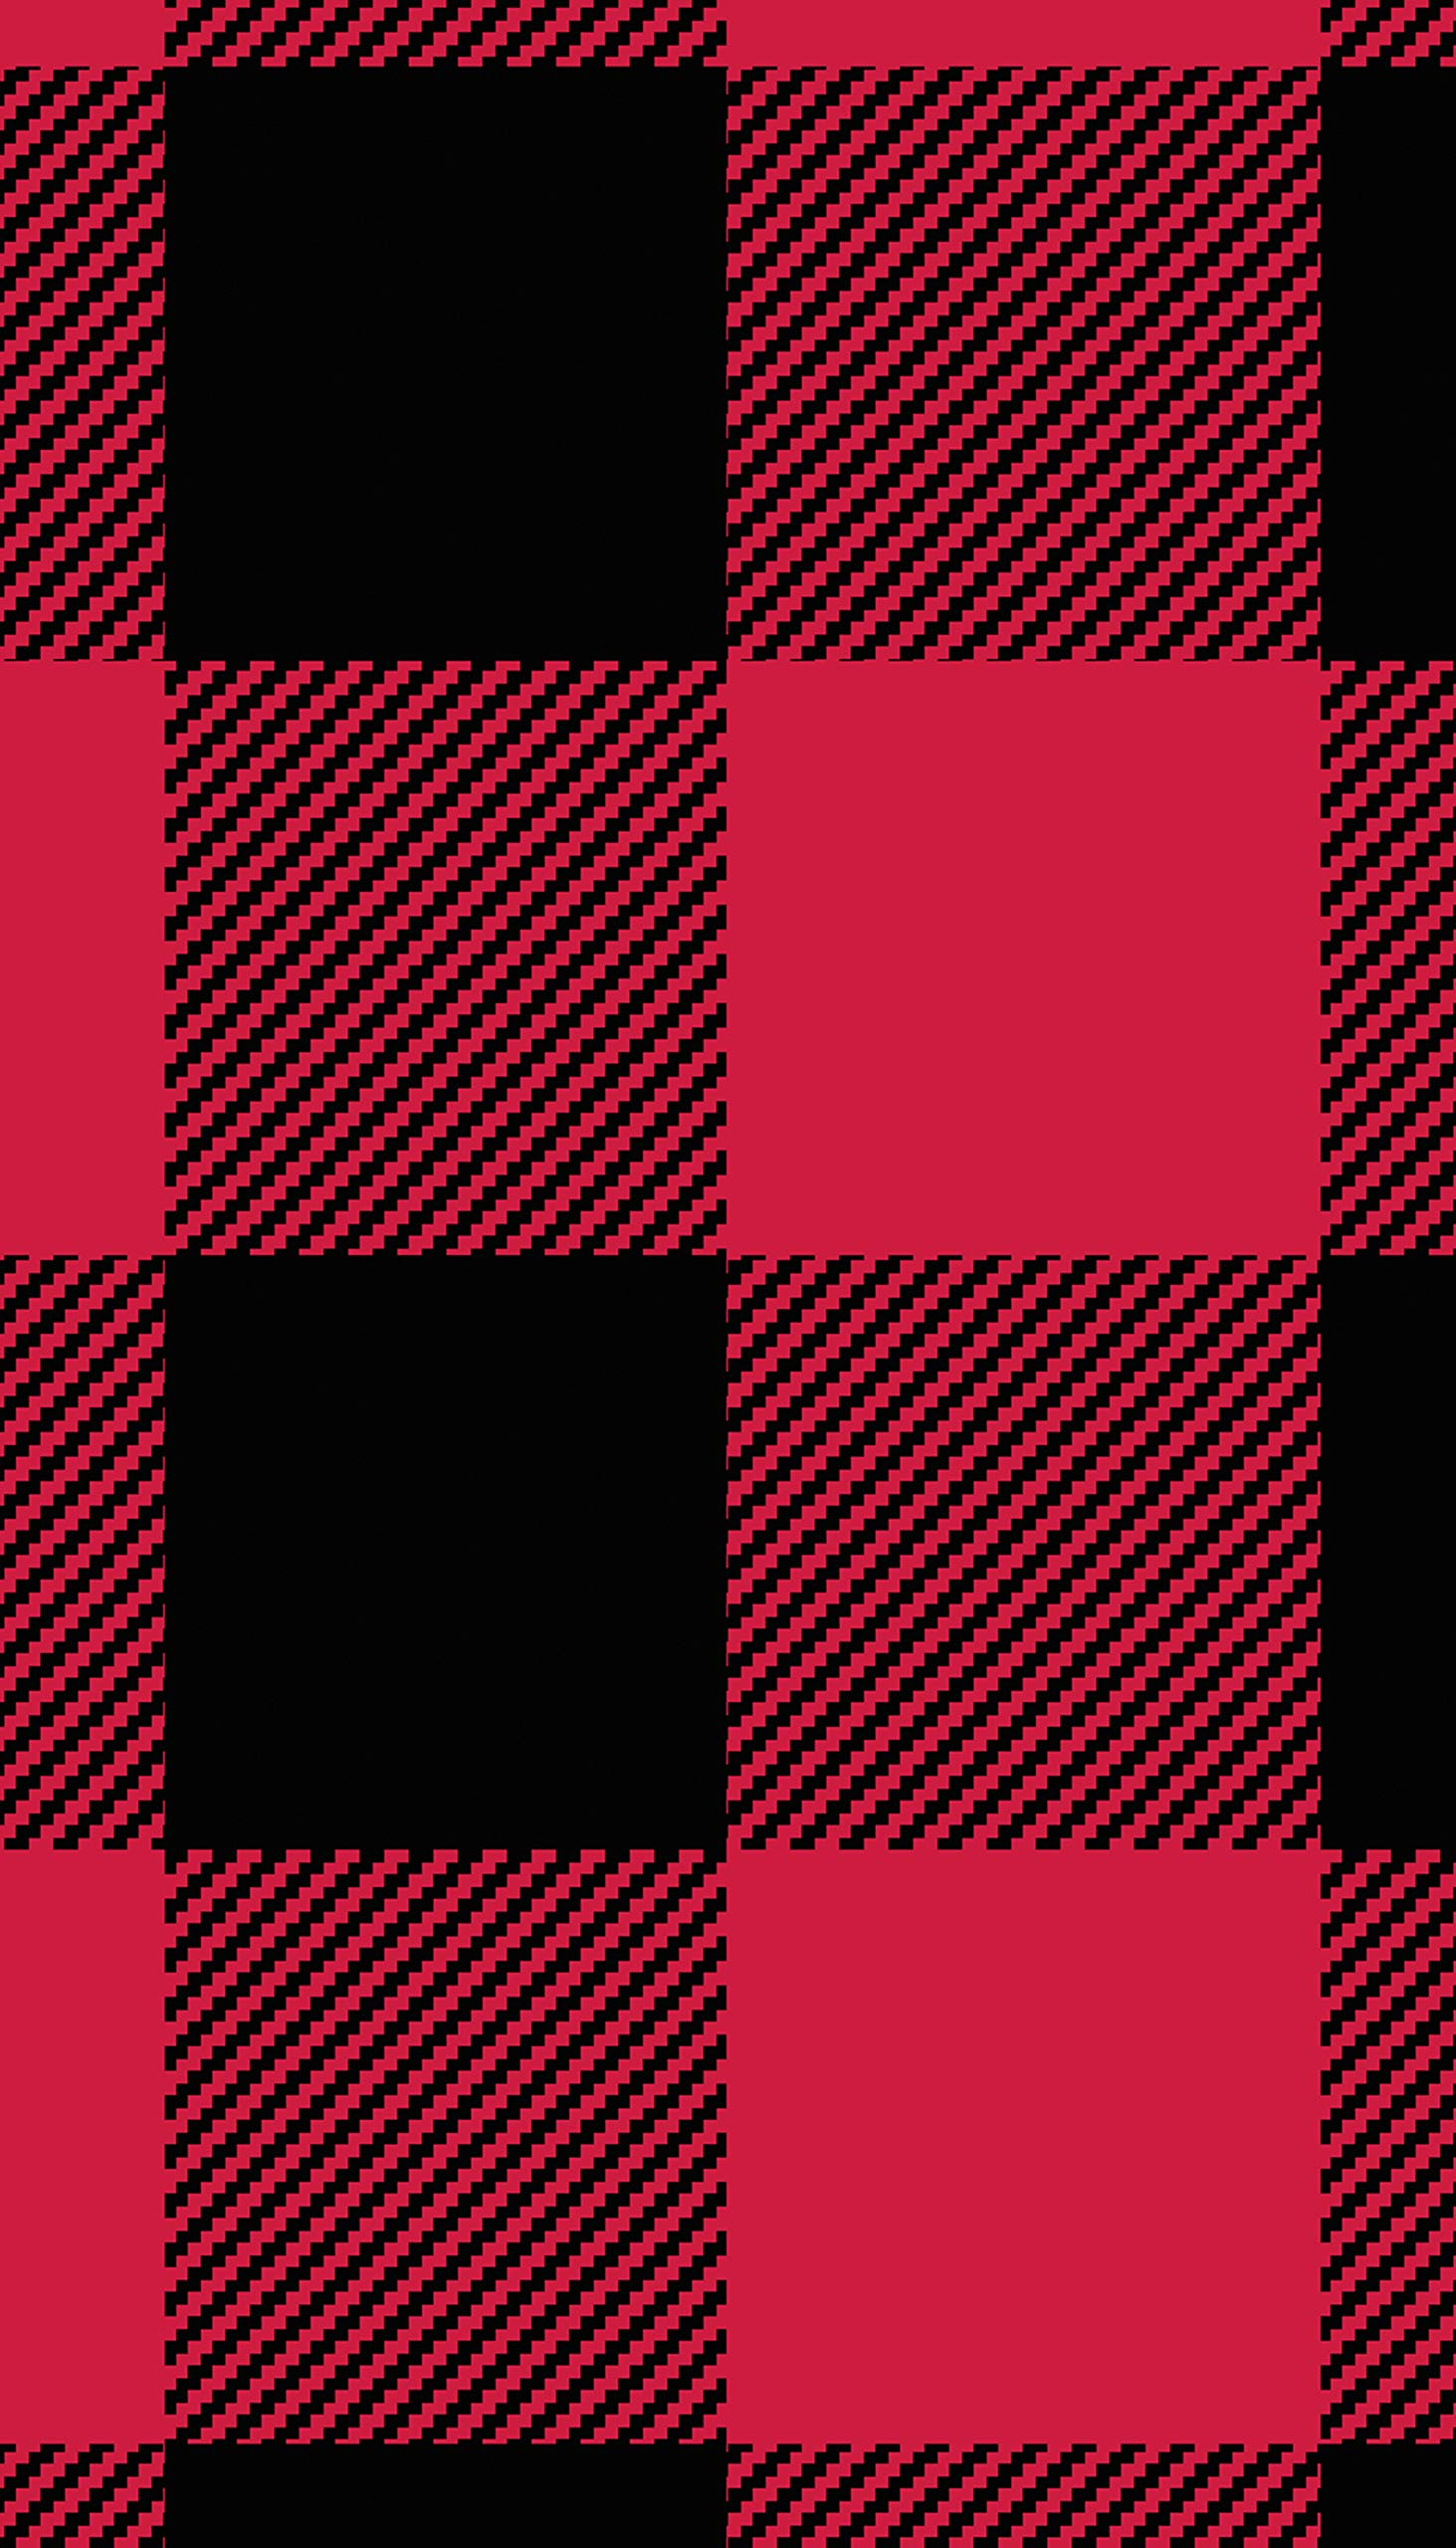 Karen Neuburger Girls' Little Family Matching Christmas Holiday Pajama Sets PJ, Buffalo Plaid red Cherry/Black Combo, Kid M by Karen Neuburger (Image #6)